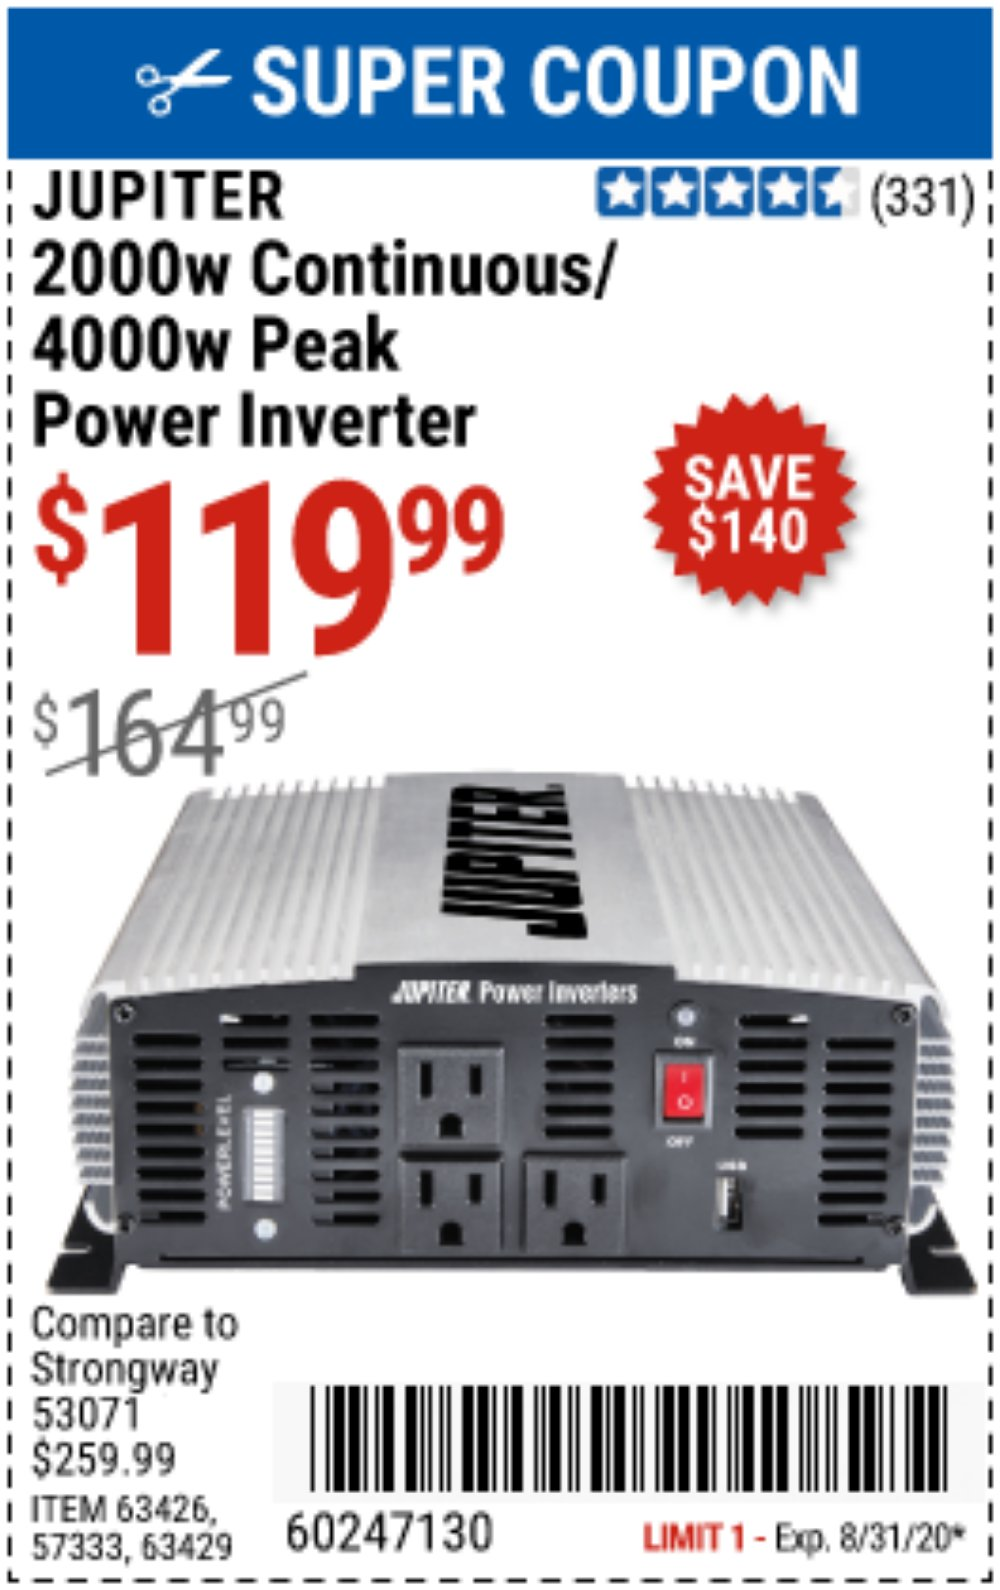 Harbor Freight Coupon, HF Coupons - 2000 Watt Continuous/4000 Watt Peak Power Inverter